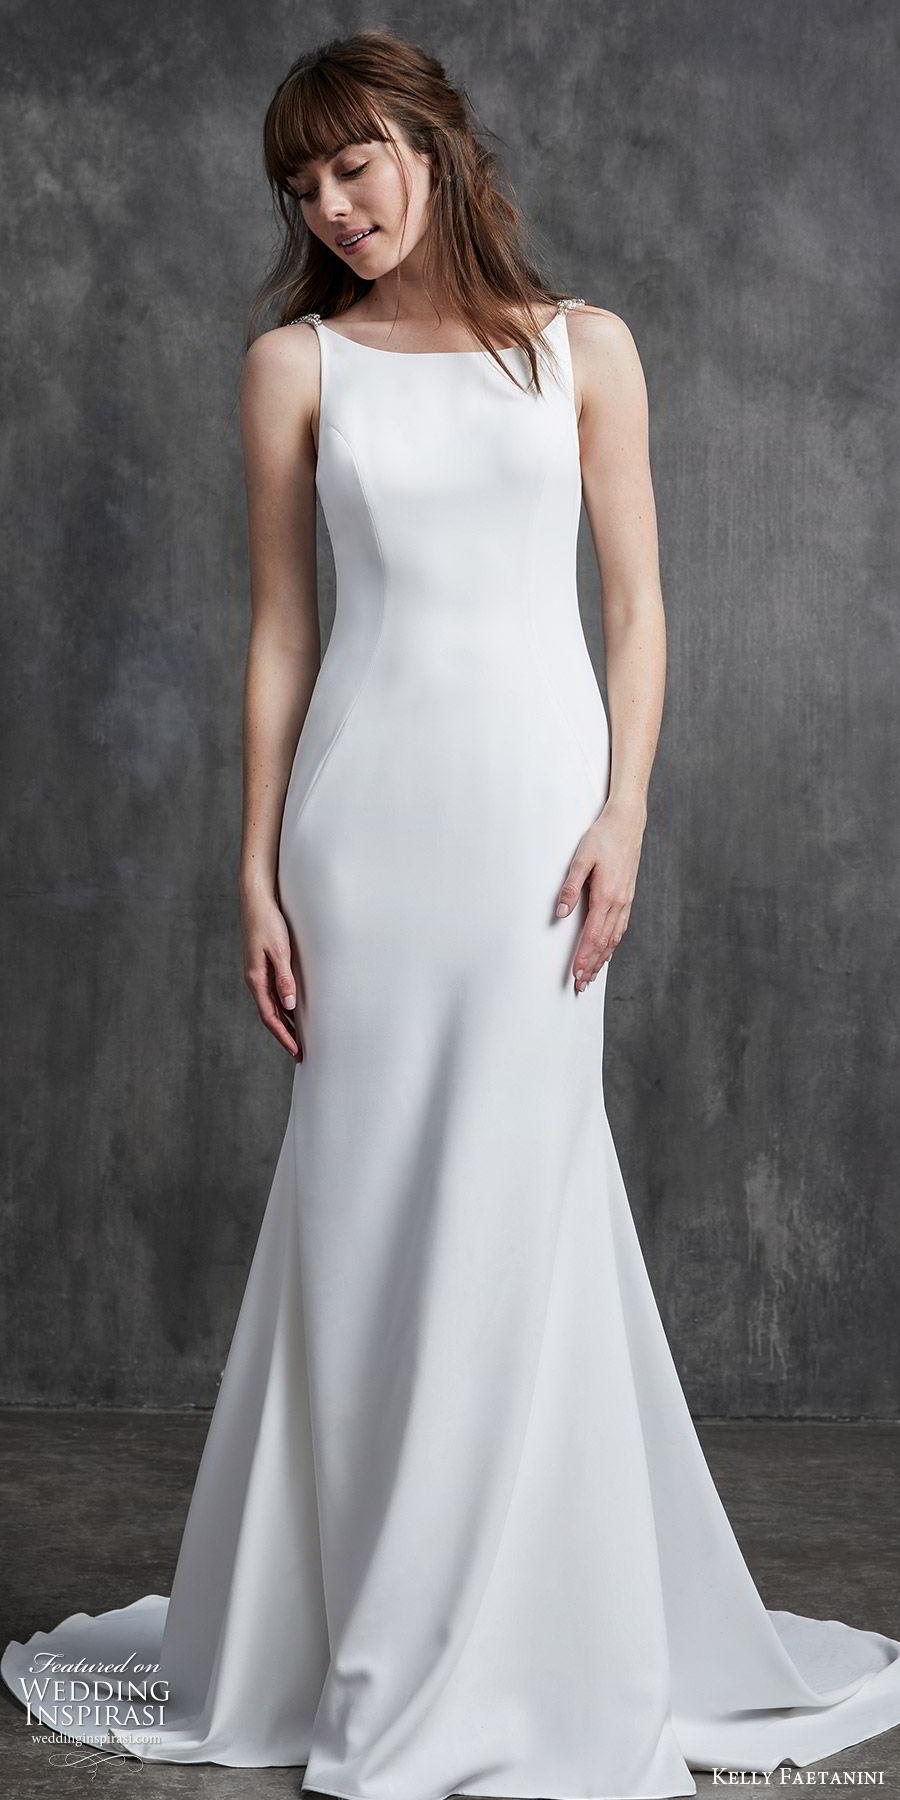 kelly faetanini spring 2020 bridal sleeveless beaded straps bateau neckline sheath wedding dress (10) low open back chapel train clean minimalist mv